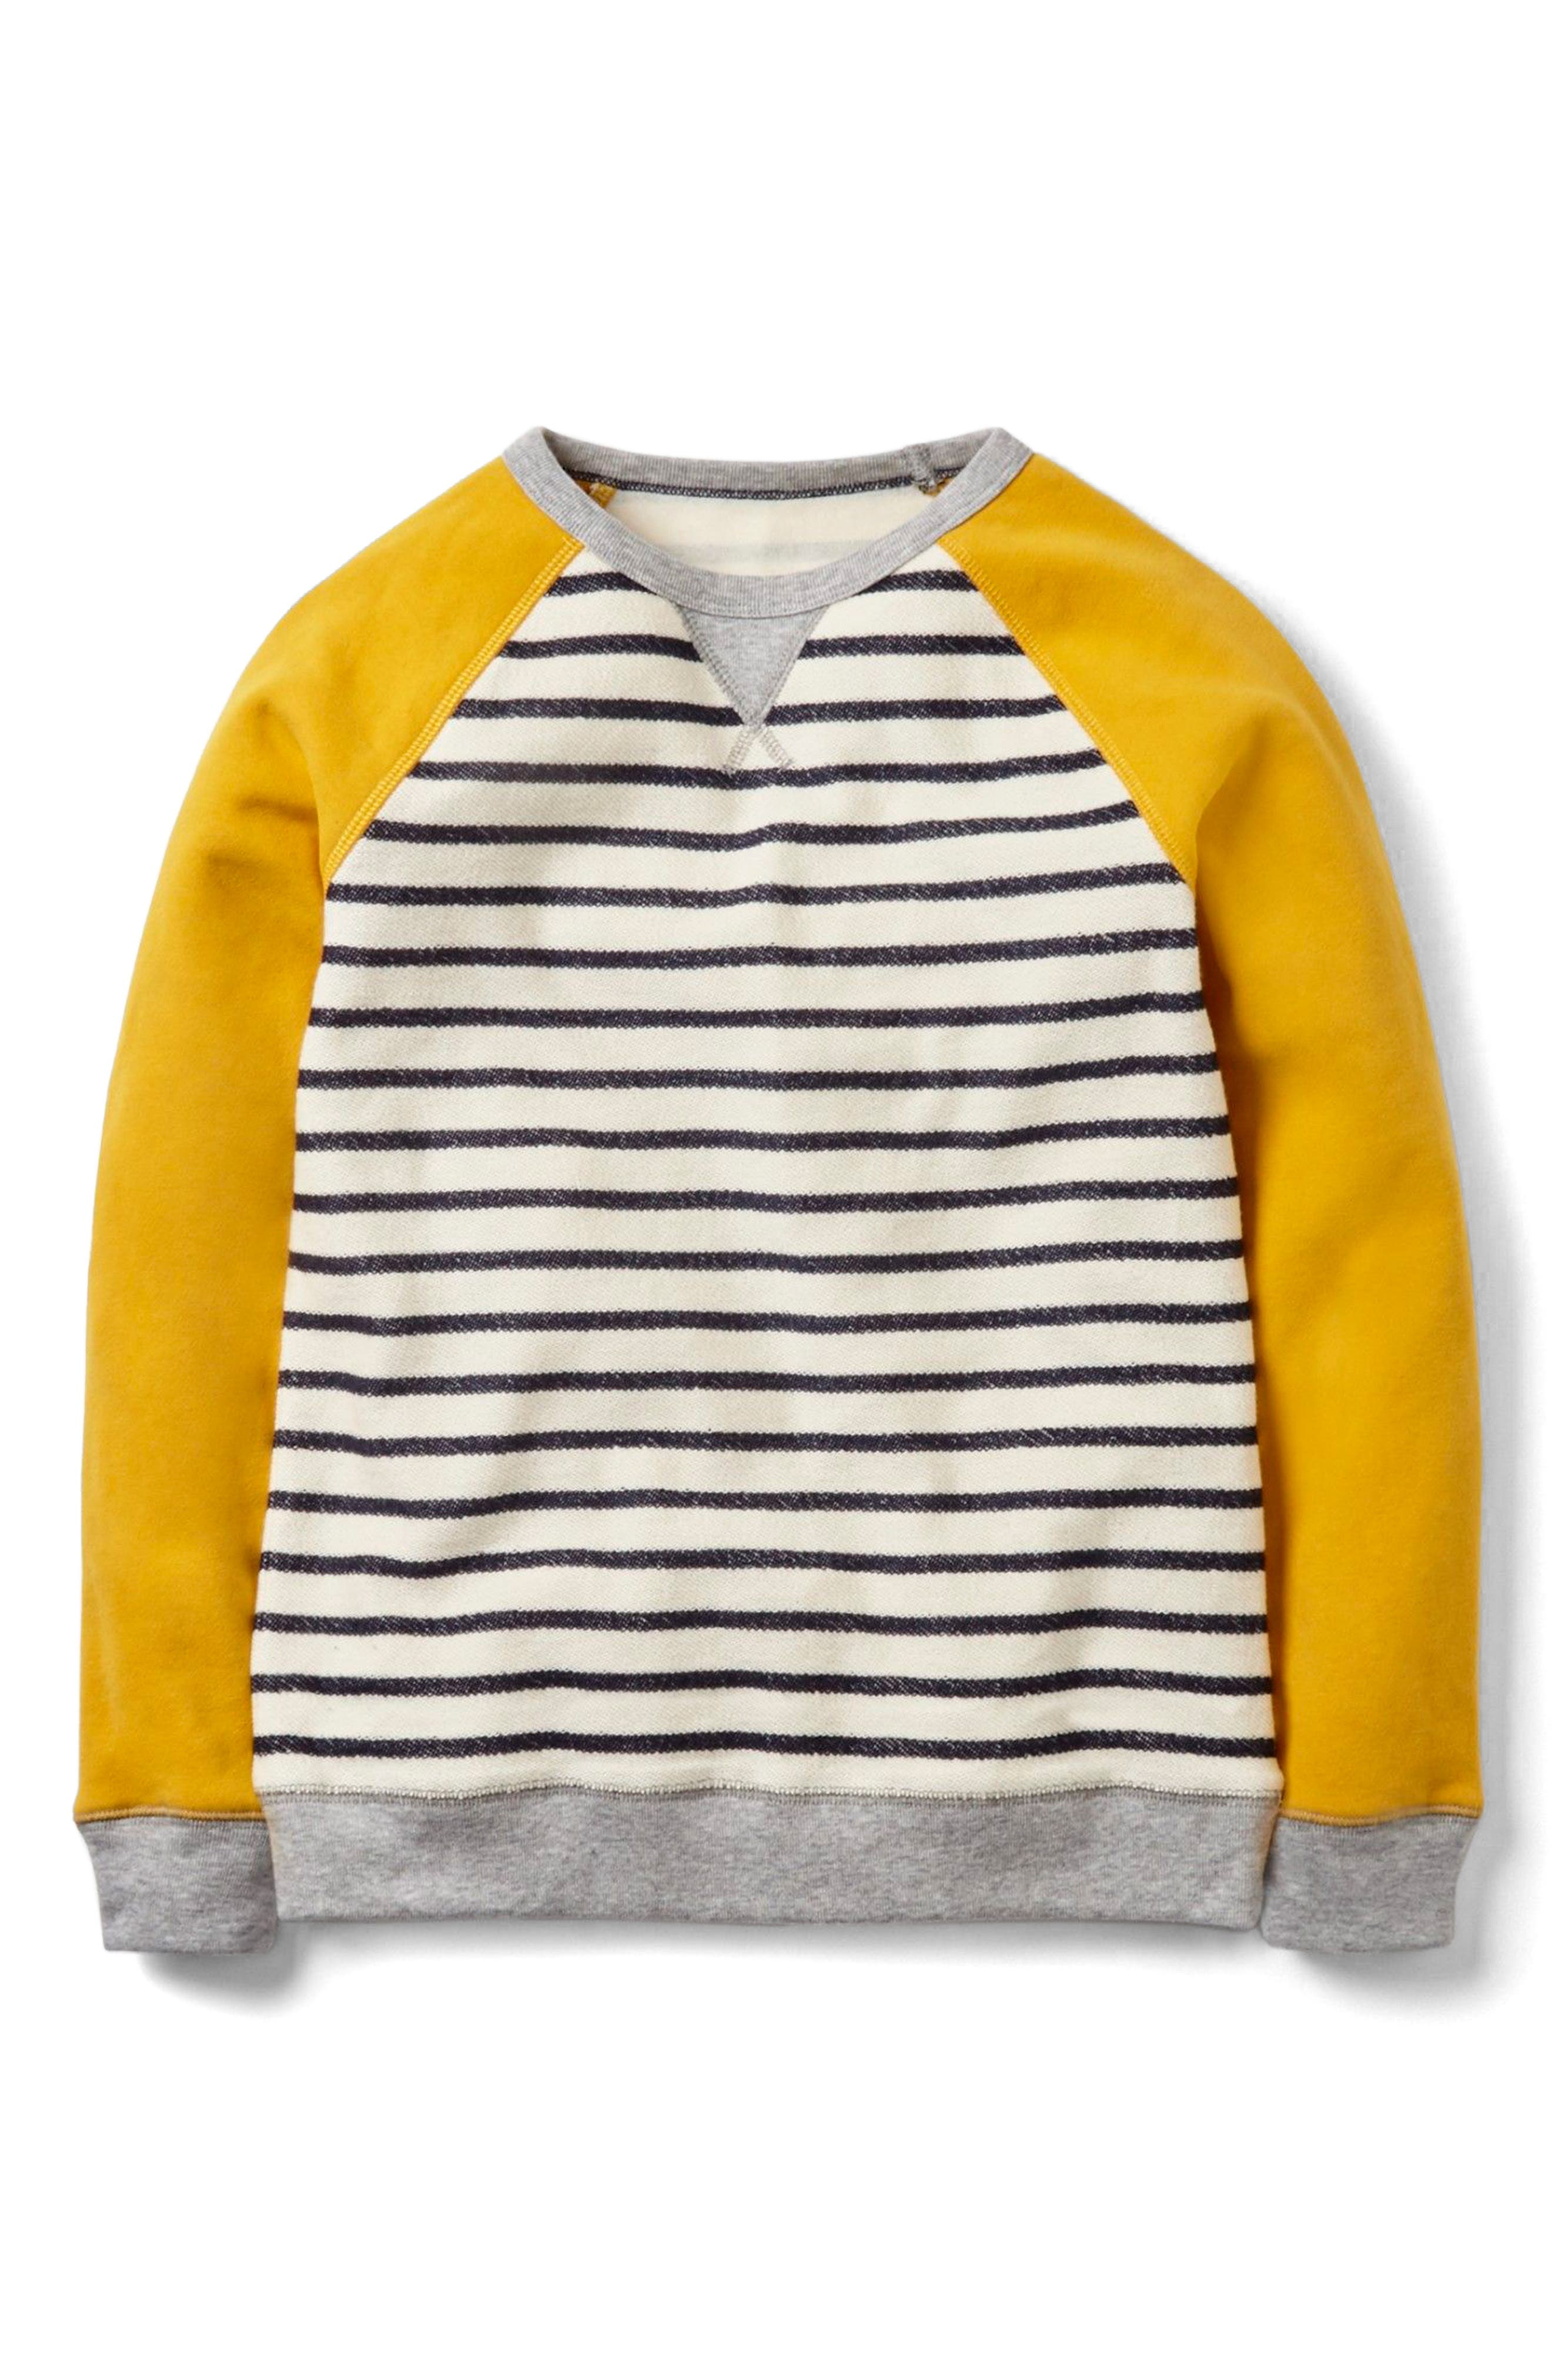 Main Image - Mini Boden Essential Sweatshirt (Toddler Boys, Little Boys & Big Boys)